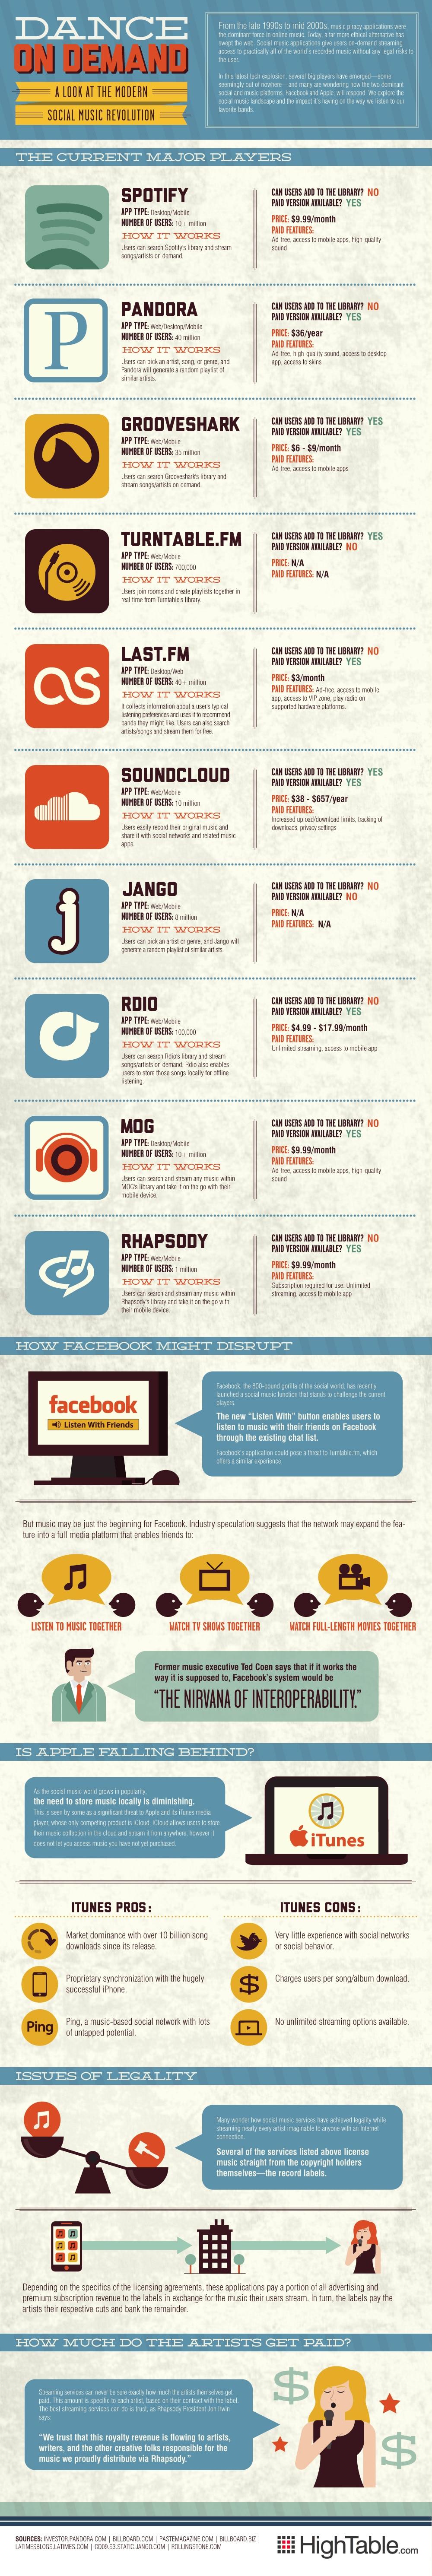 Online-music-revolution-infographic